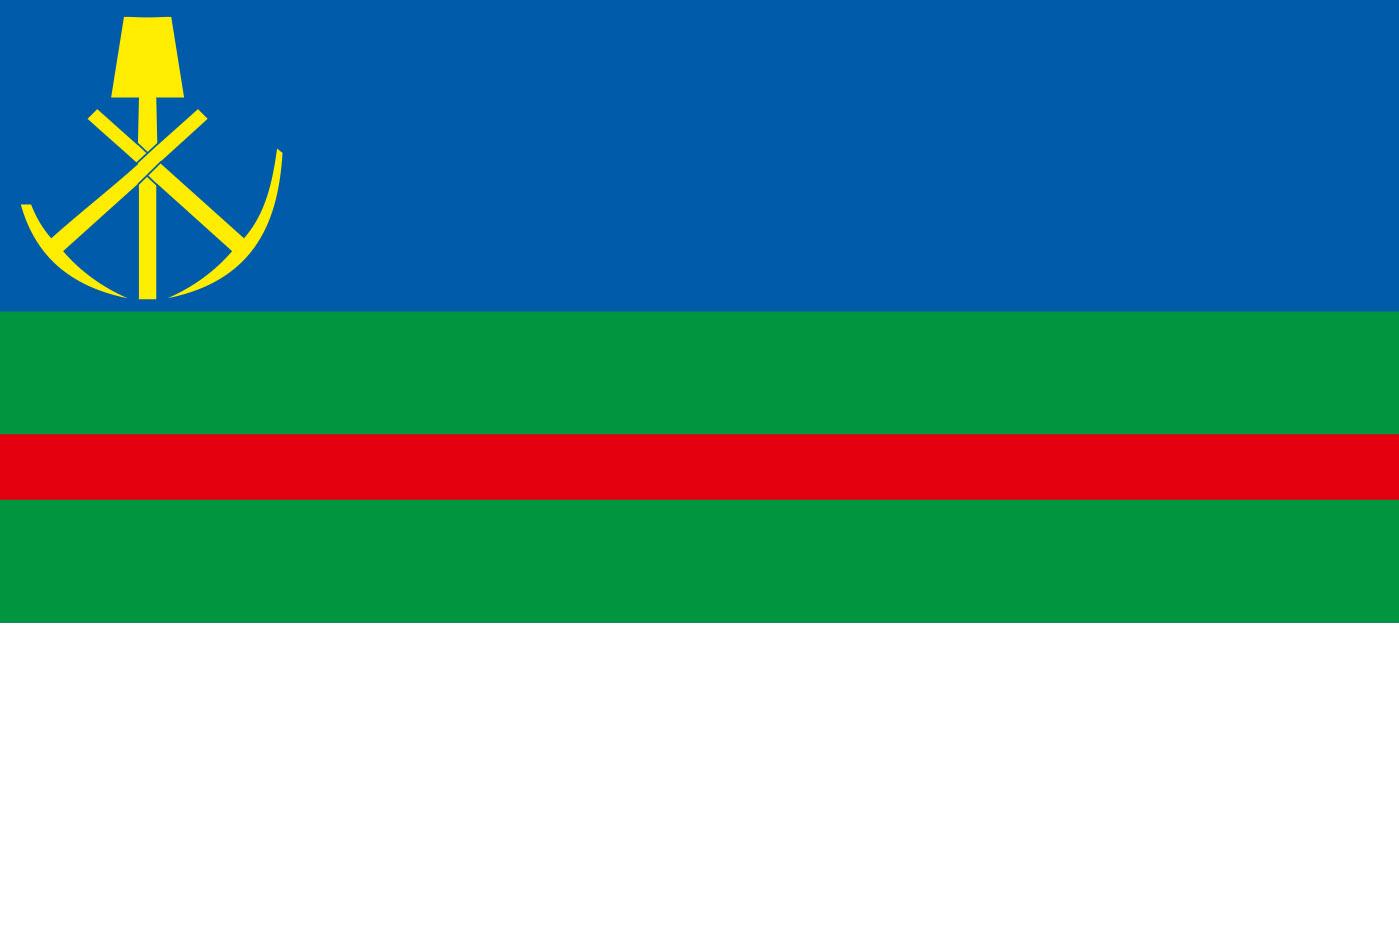 Флаг города Николаевск-на-Амуре